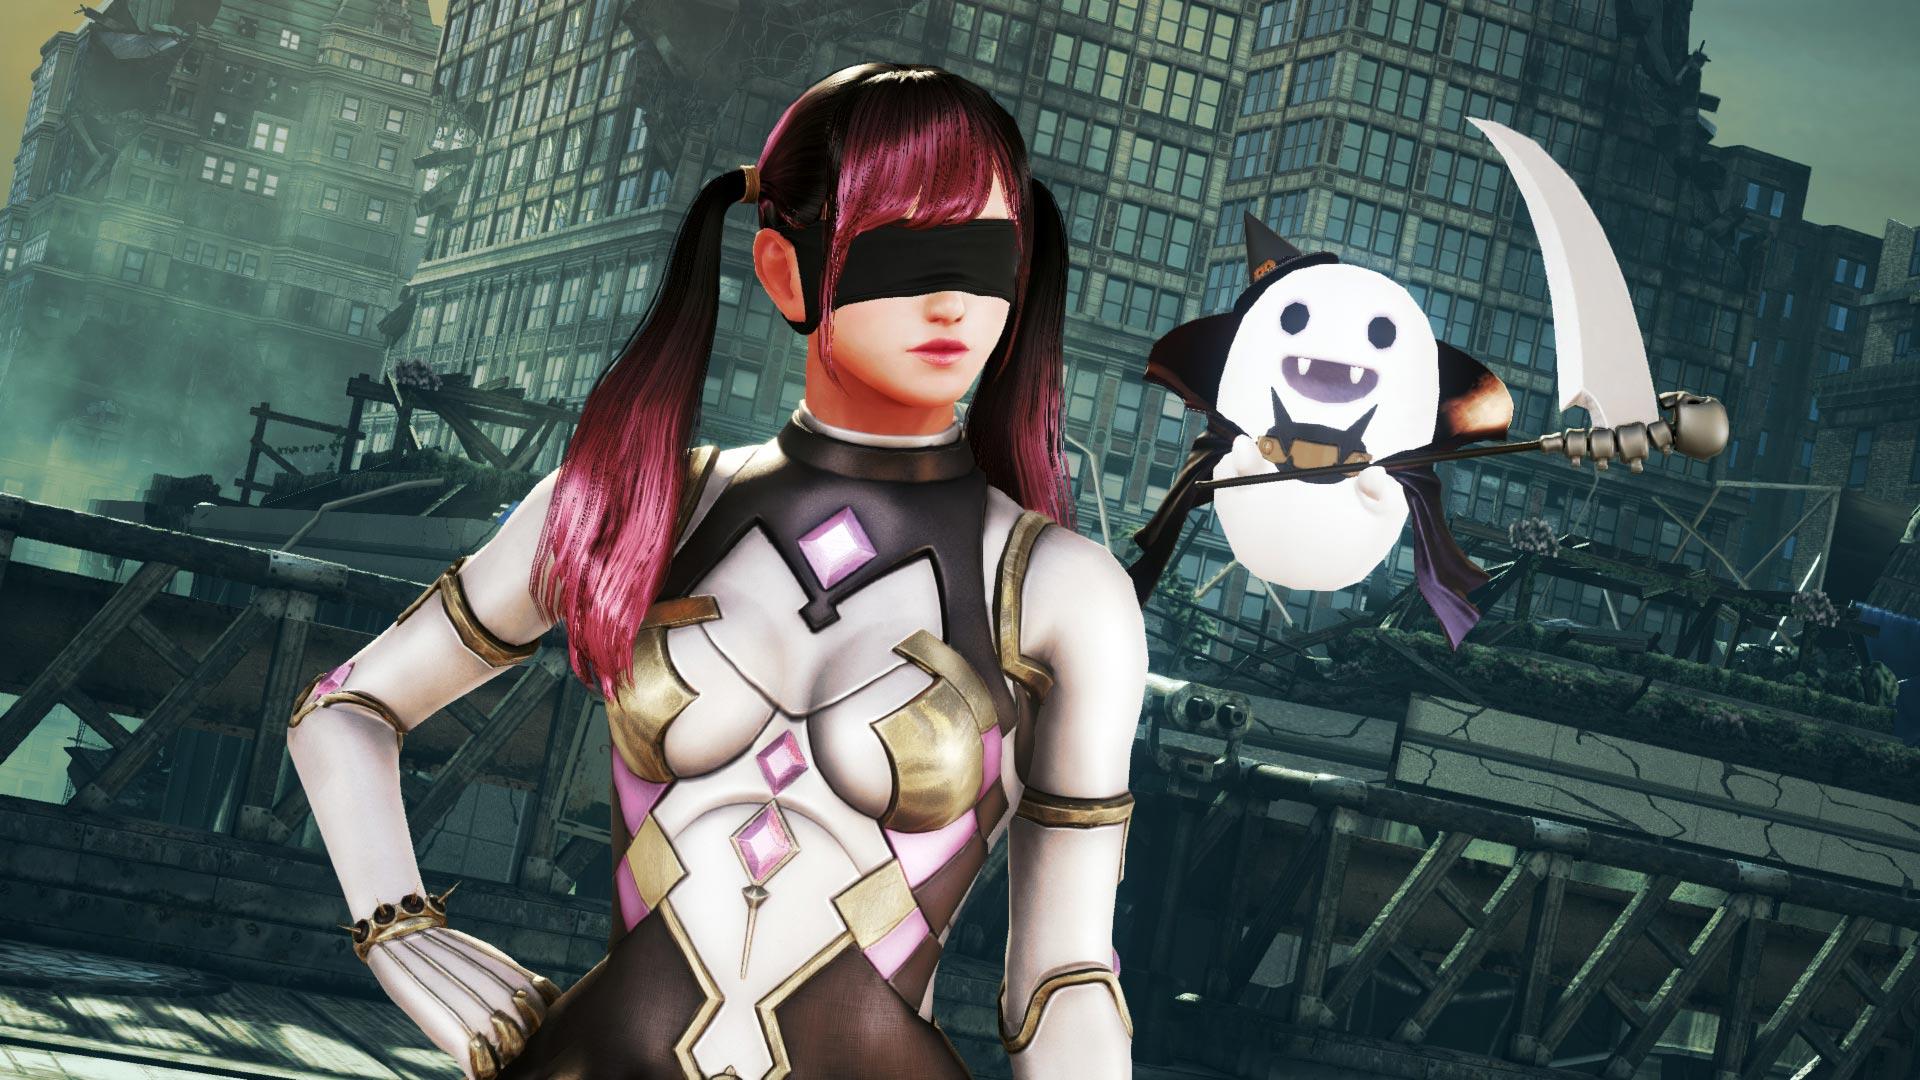 Tekken Season 3 accessories 4 out of 4 image gallery